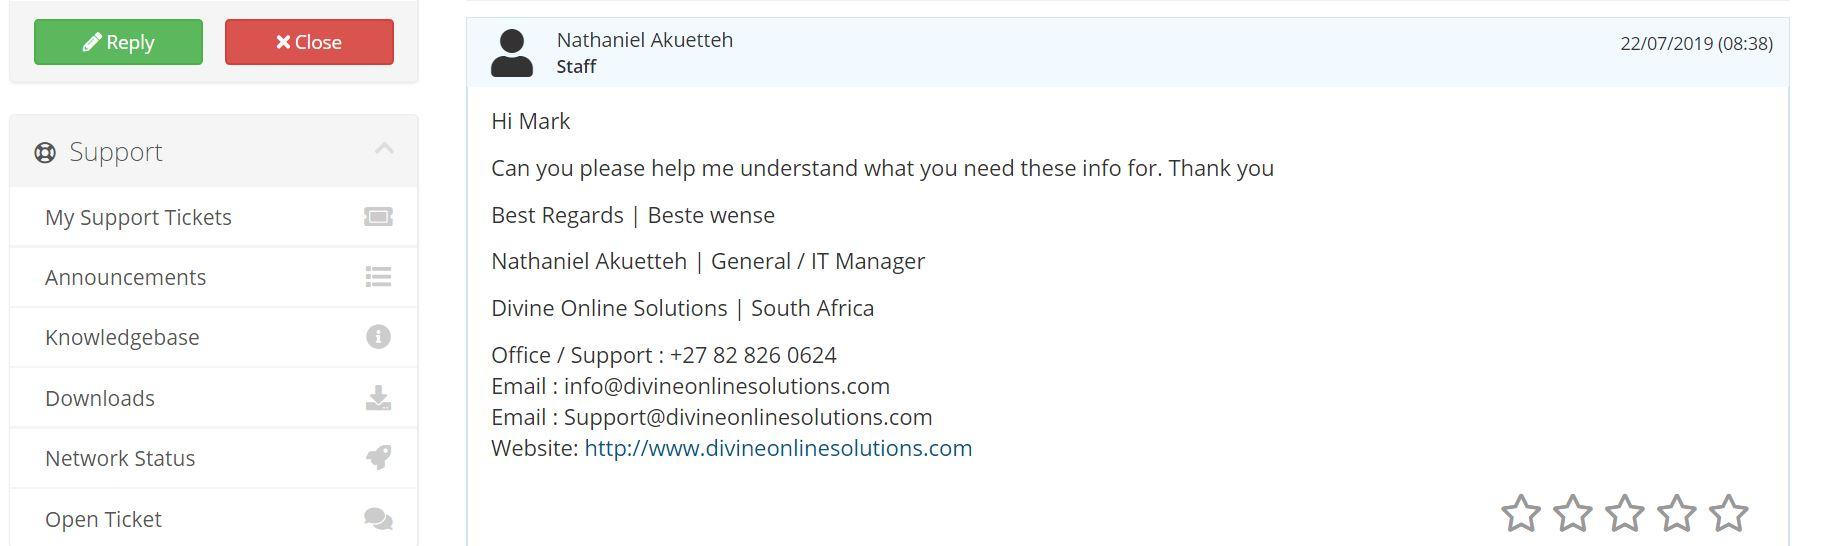 Divine Online Solutions